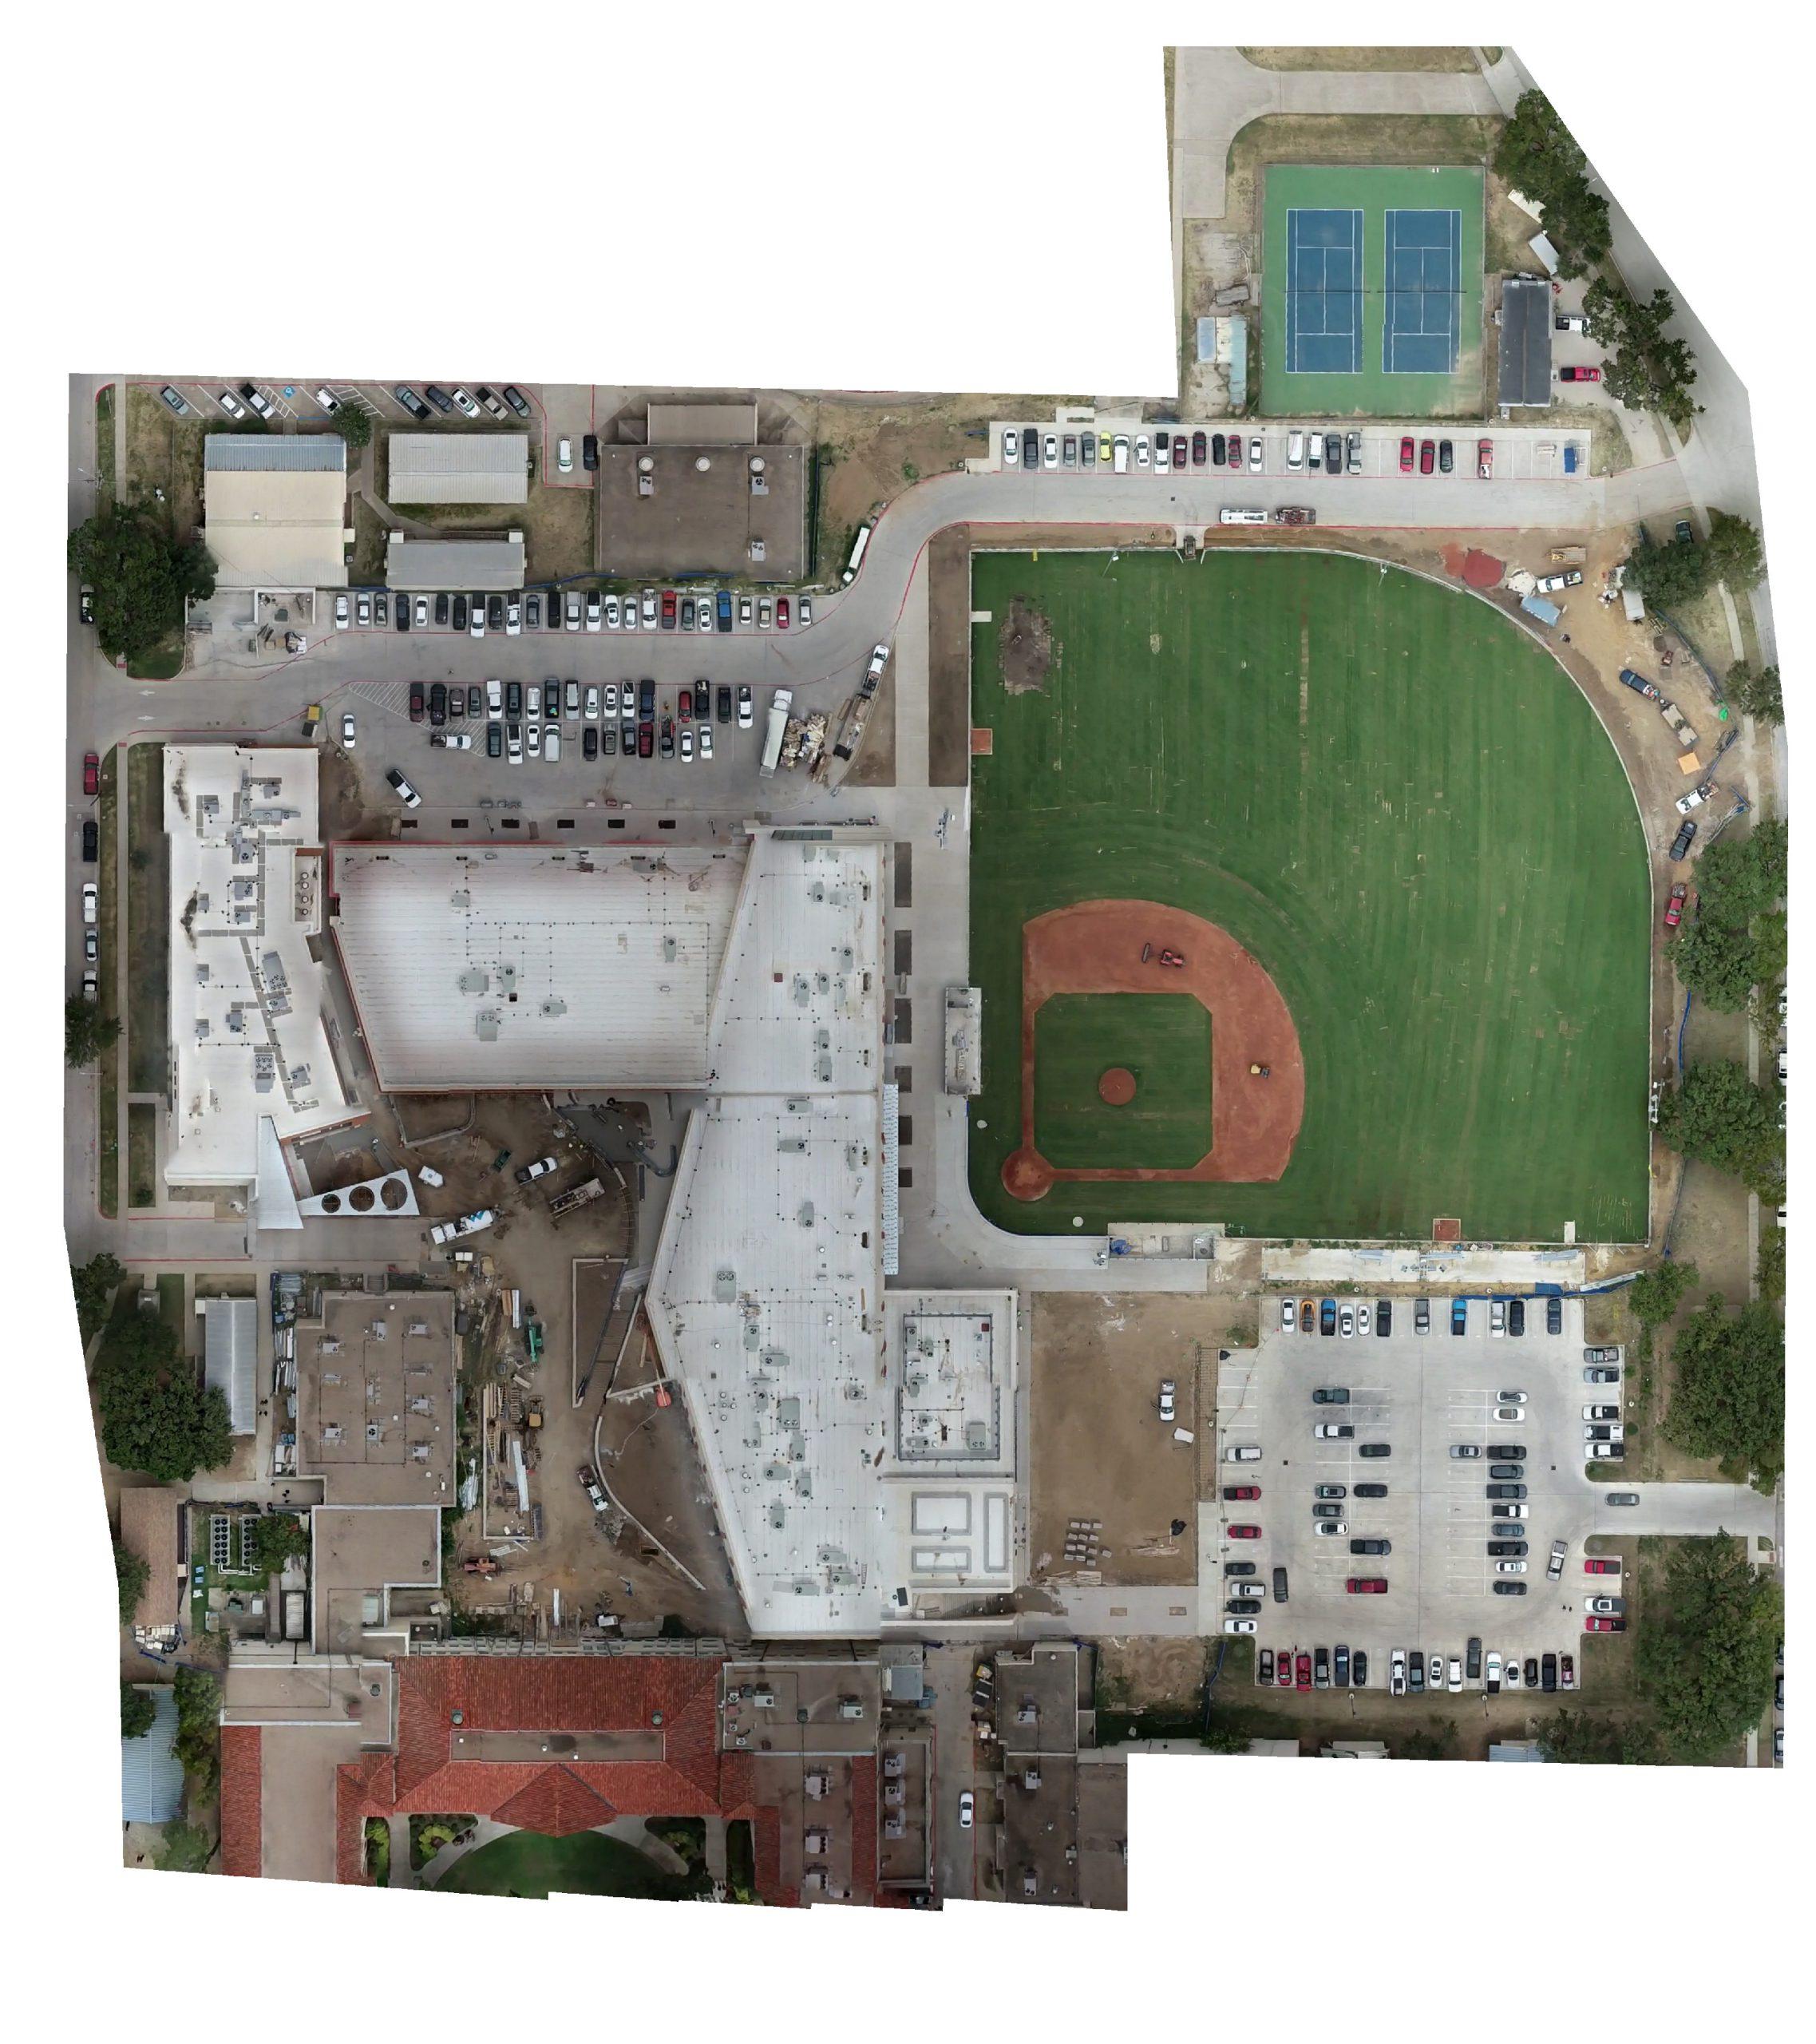 Baseball Field Work image 1